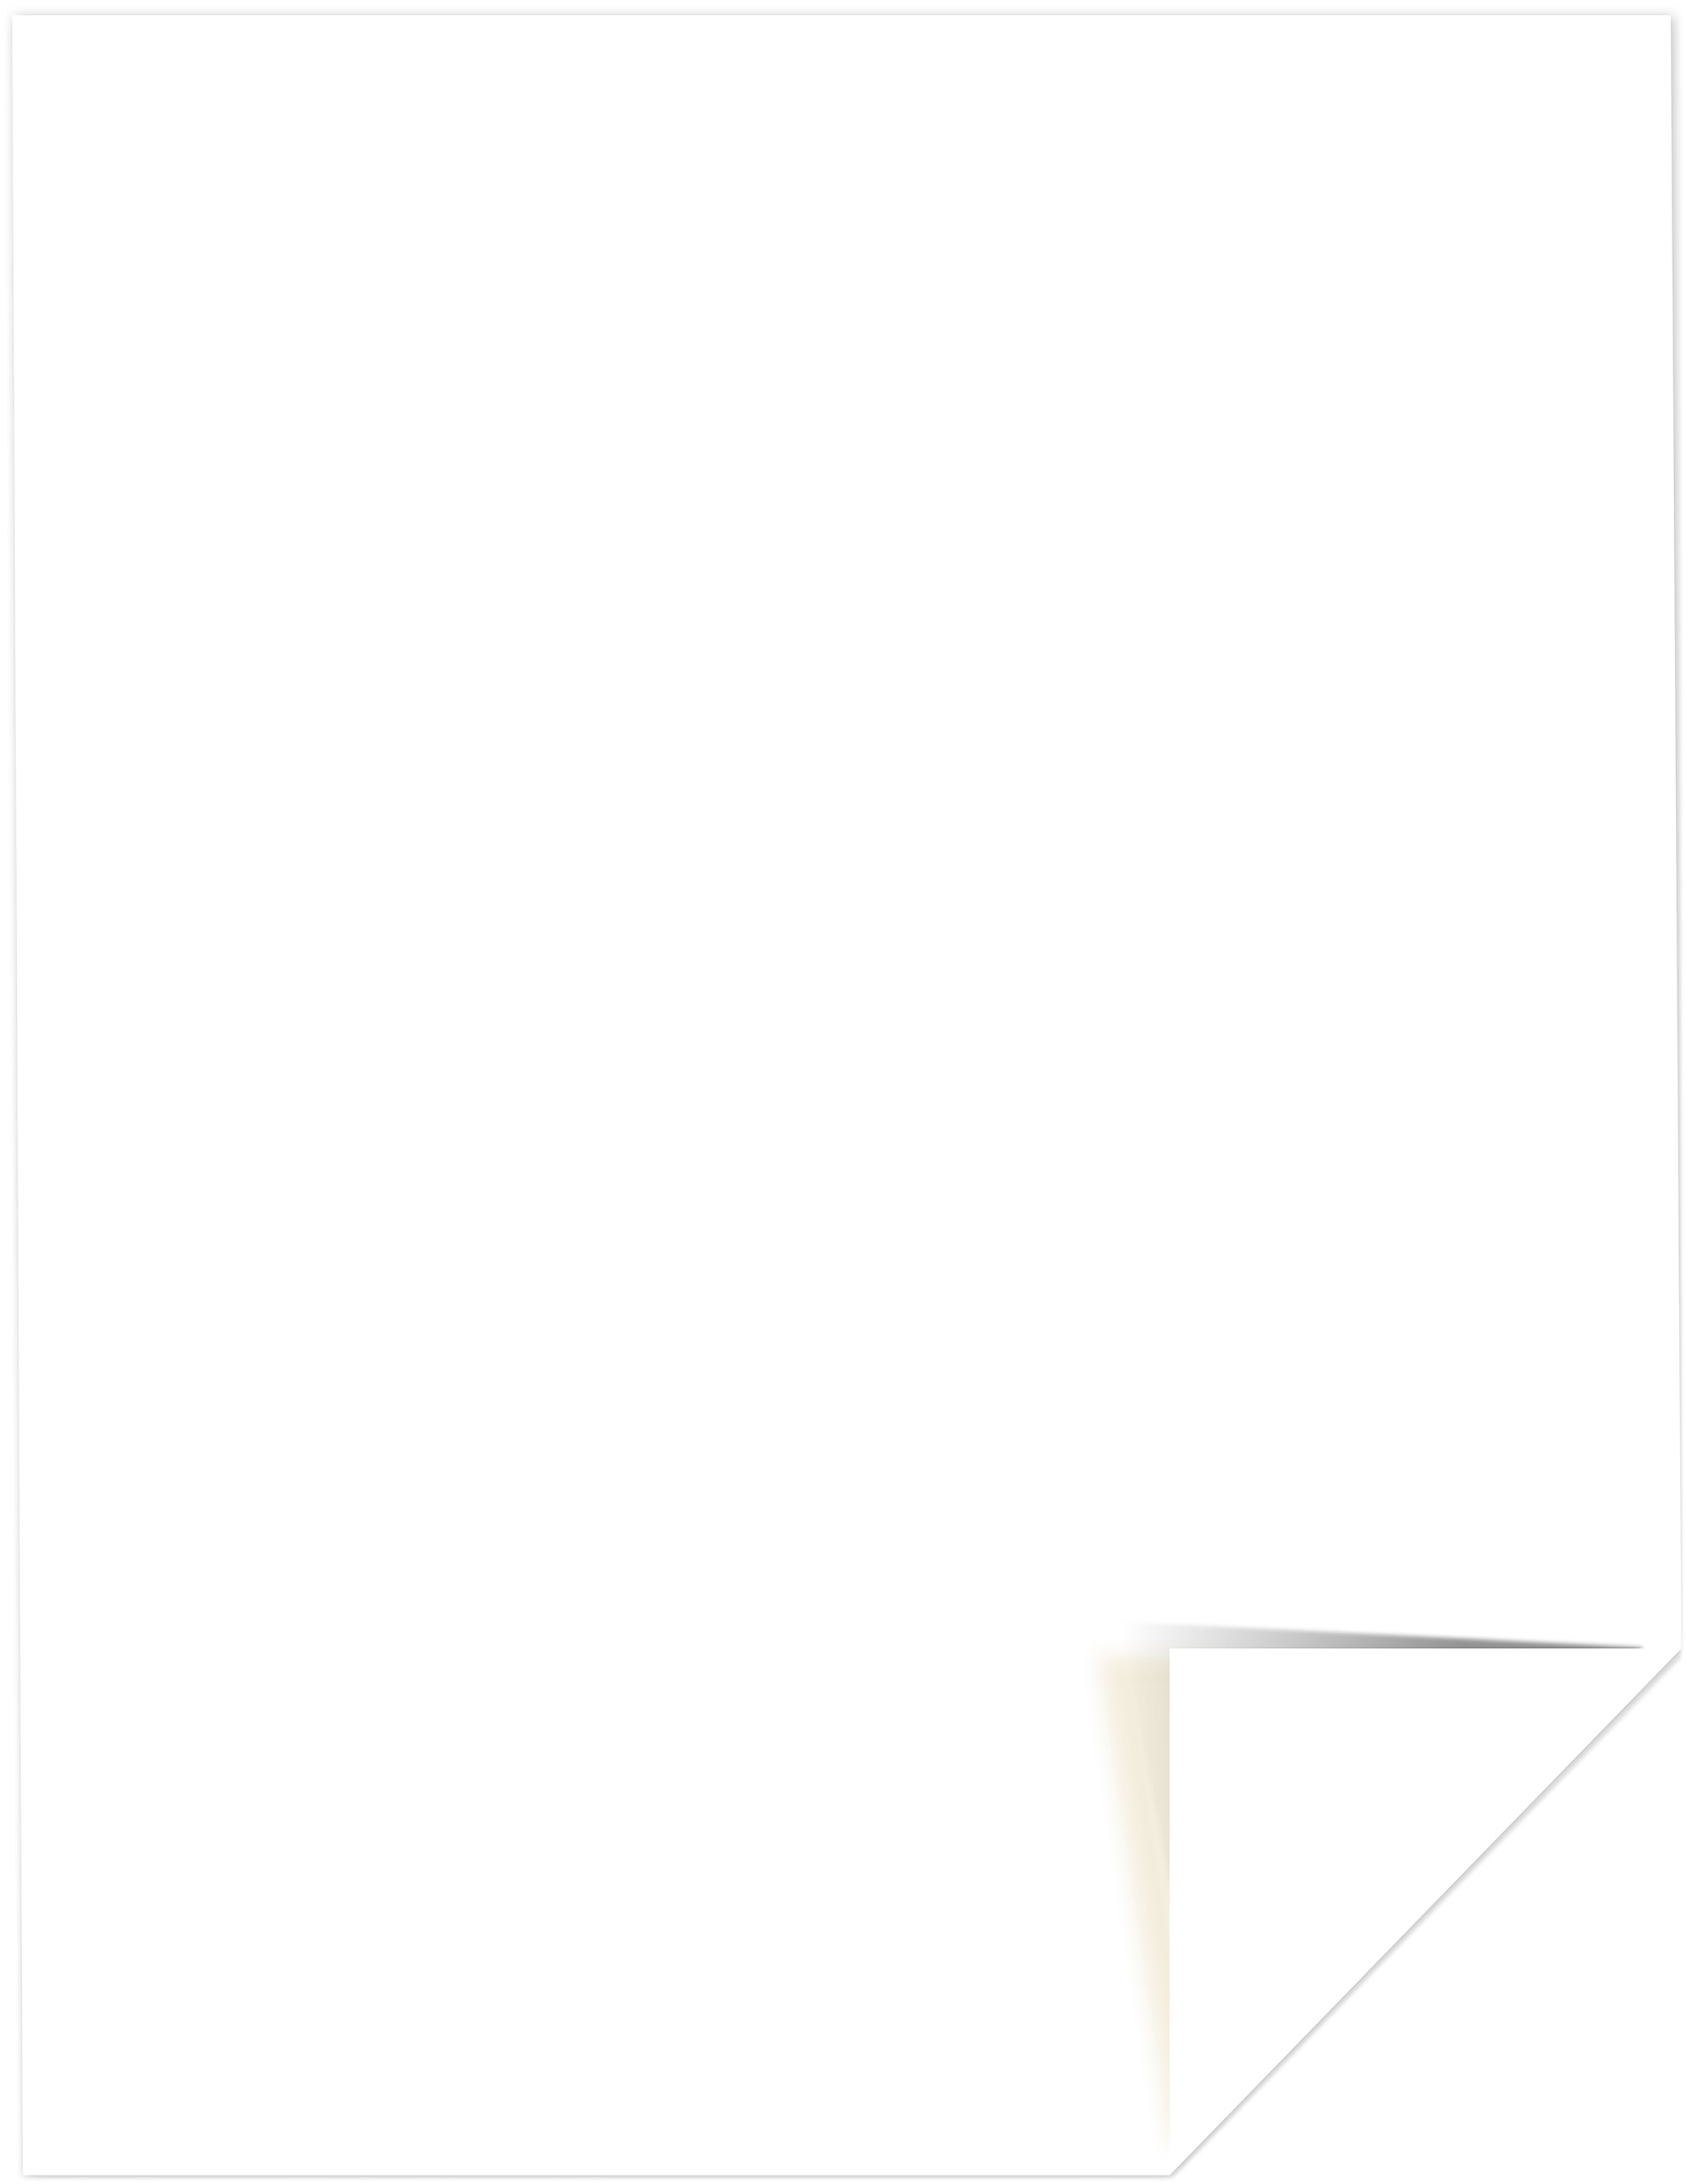 Neenah 110lb Classic Crest Cardstock 8.5X11 25/Pkg-Solar White